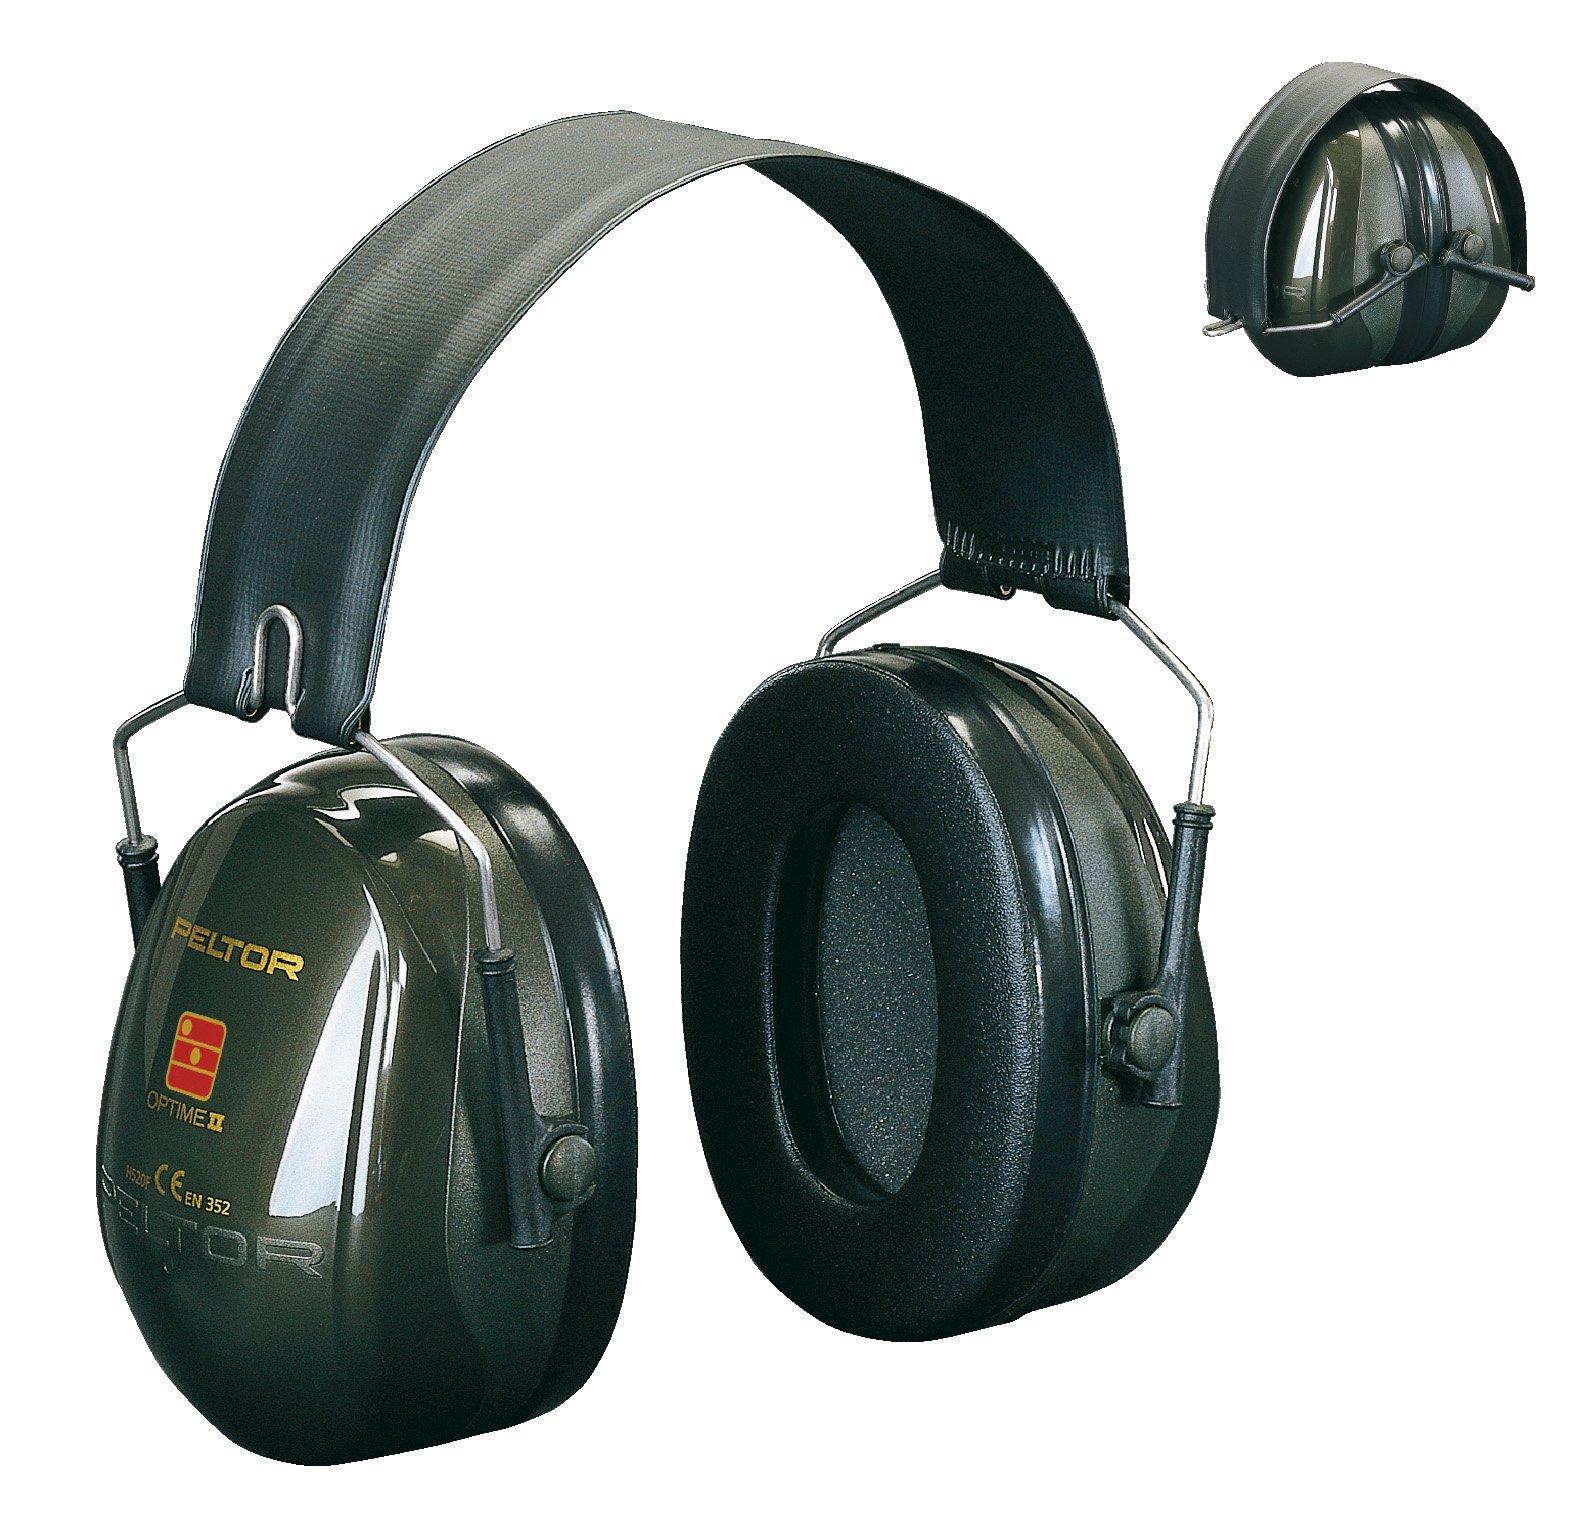 peltor optime 2 headband ear defenders. Black Bedroom Furniture Sets. Home Design Ideas